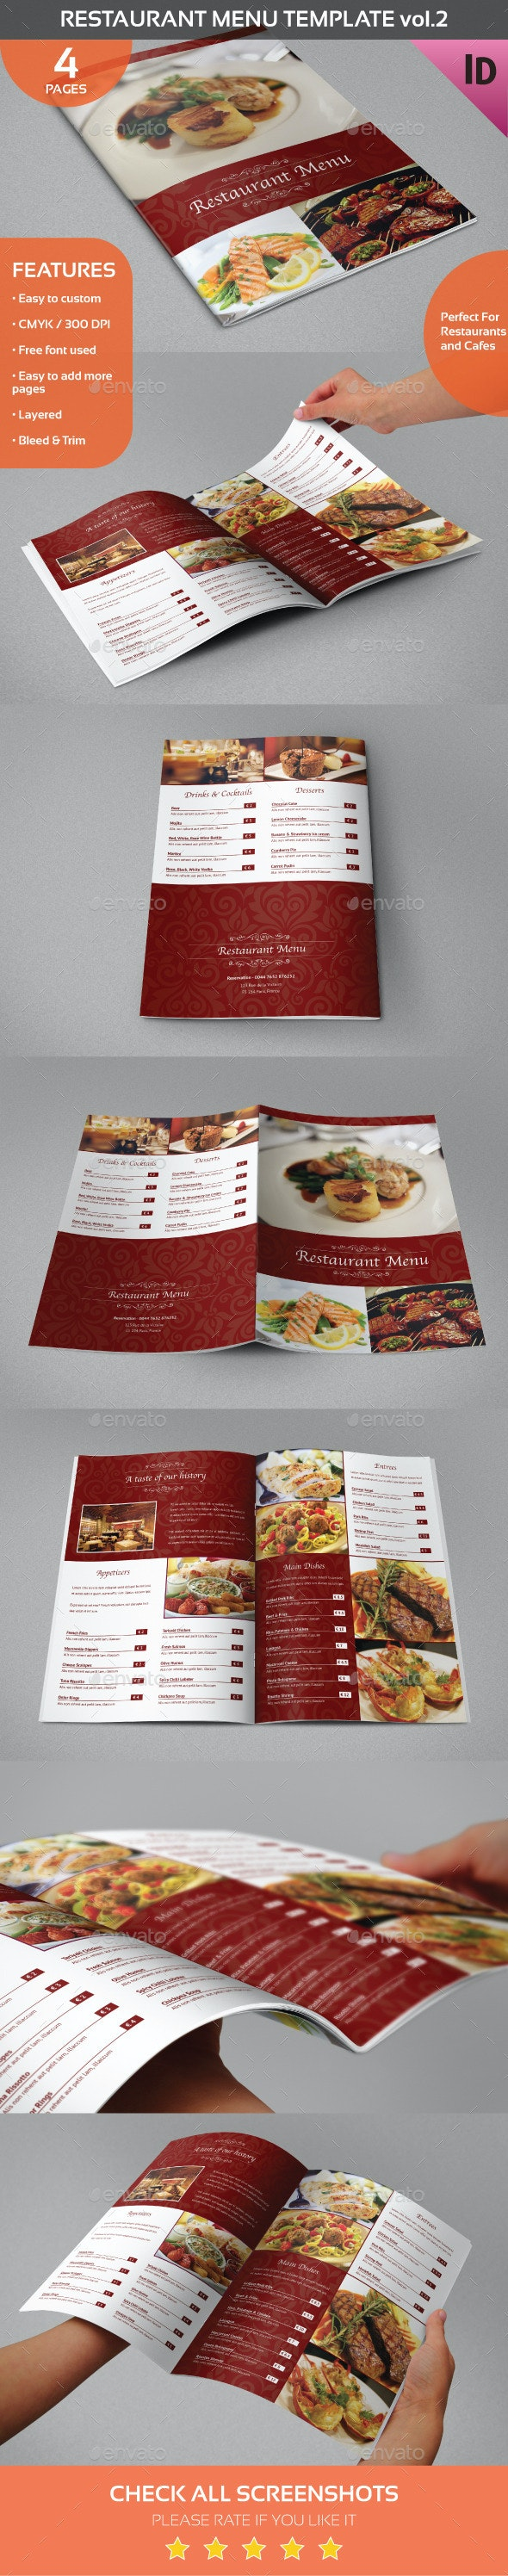 Restaurant Menu Template vol.2 - Food Menus Print Templates